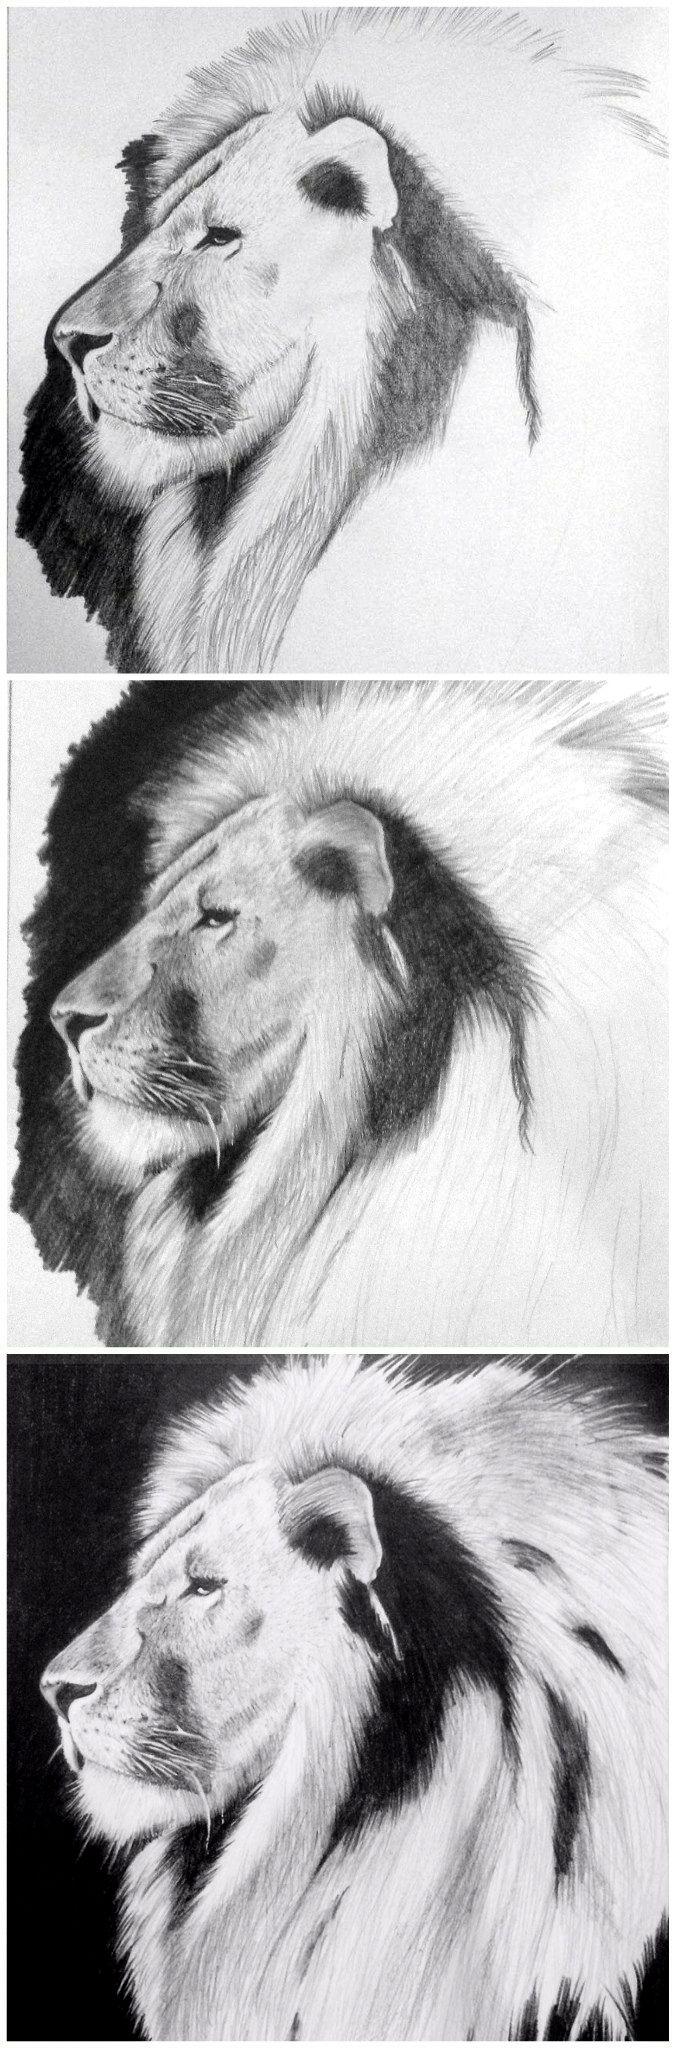 Proceso León #art #grafito #nature #floroperlini #dibujo #arte #lion #floro #perlini #illustration #sketch #blackandwhite #blancoynegro #animals #process